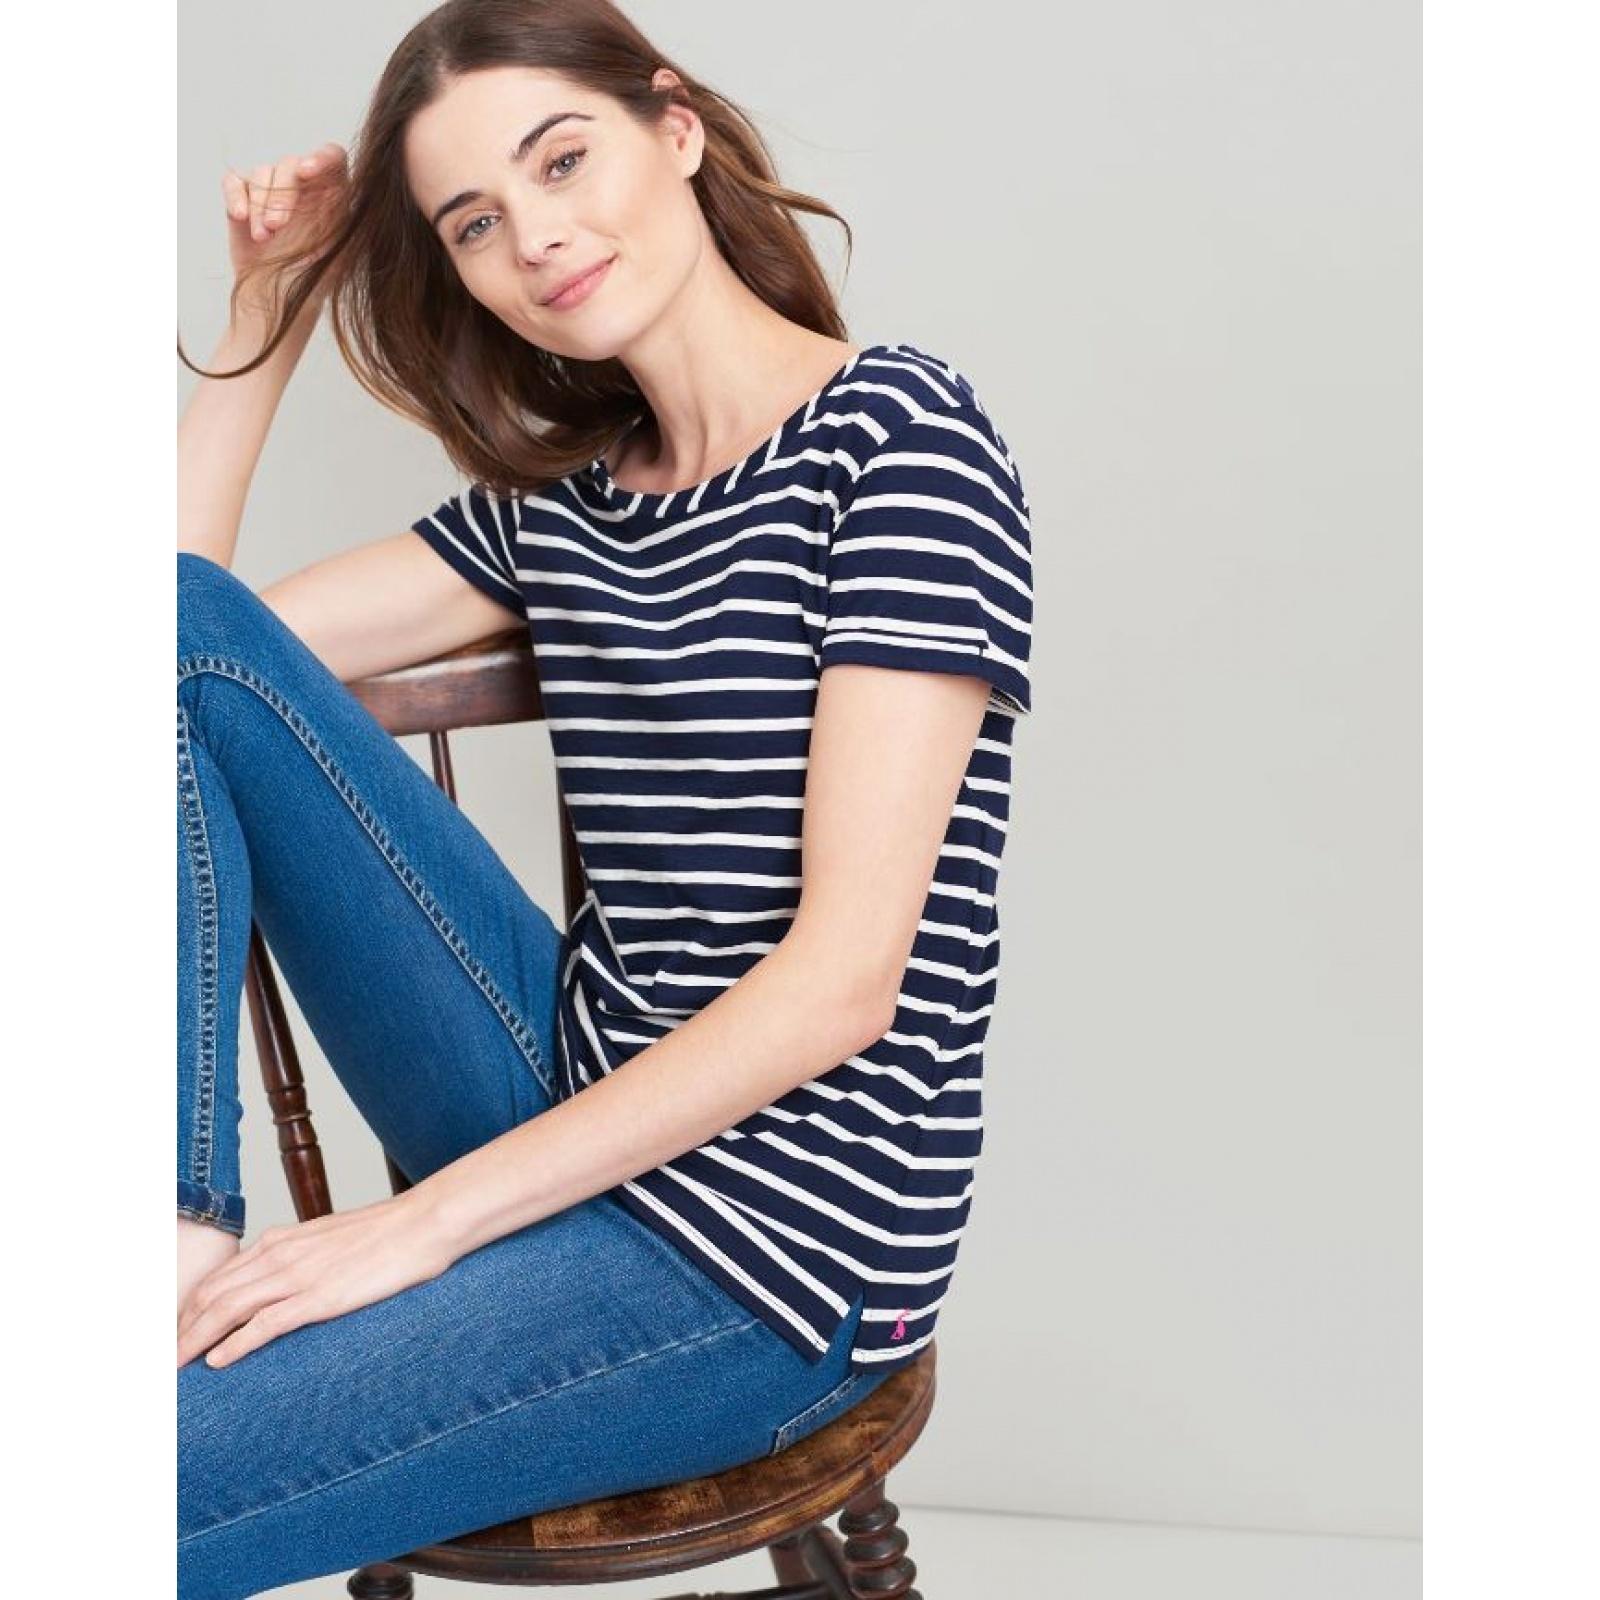 Joules-Nessa-Raya-Ligero-Jersey-Camiseta-SS19 miniatura 18